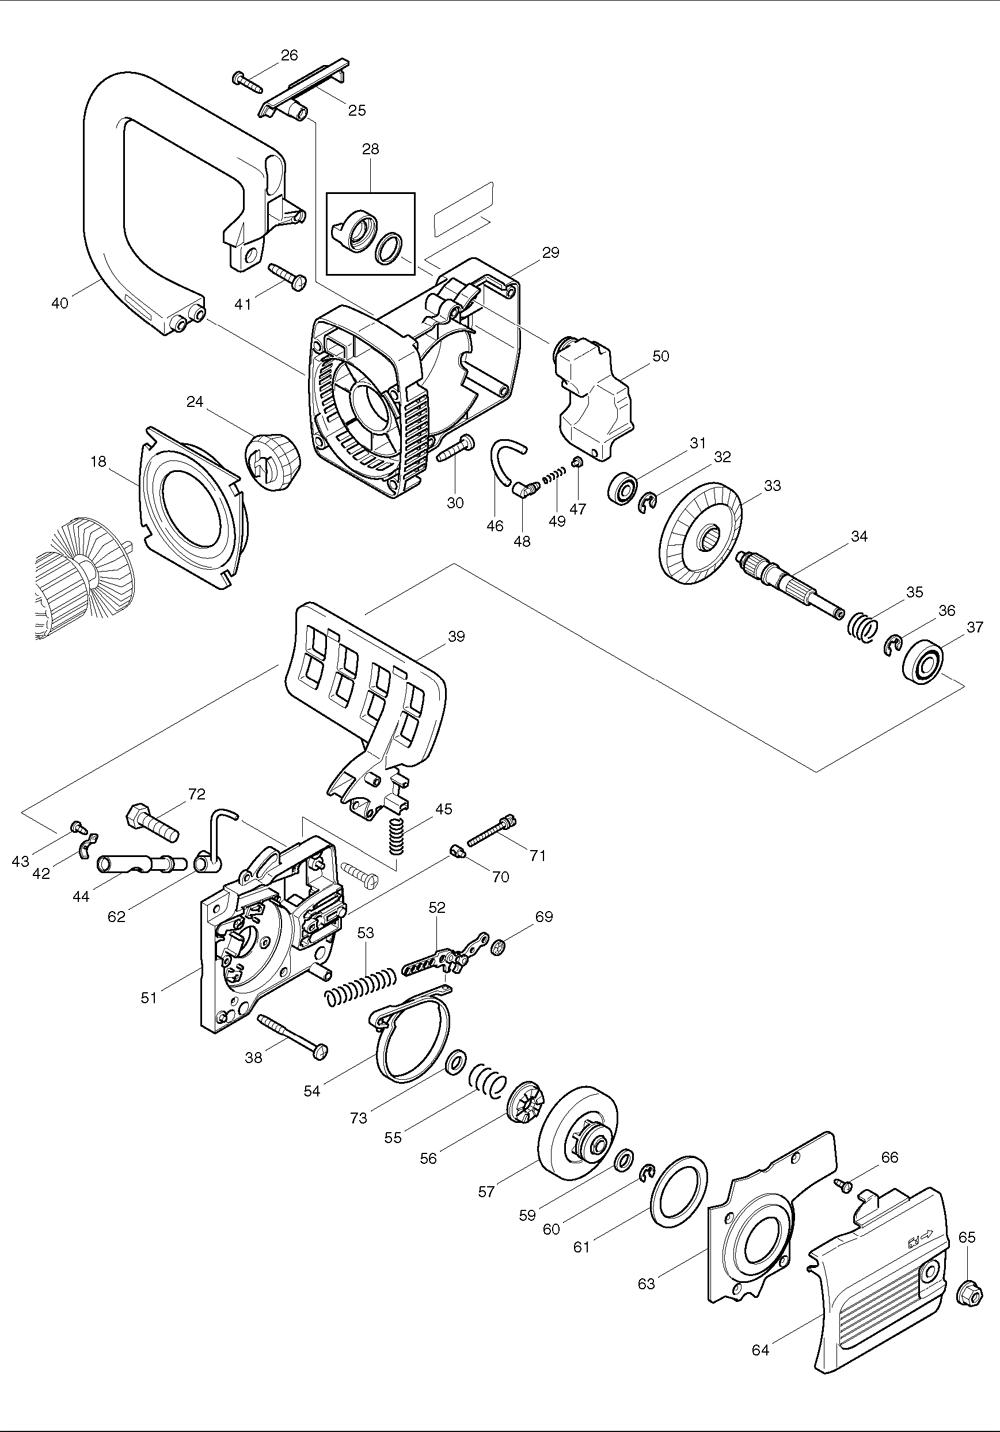 Makita-UC3500-228-PBBreak Down